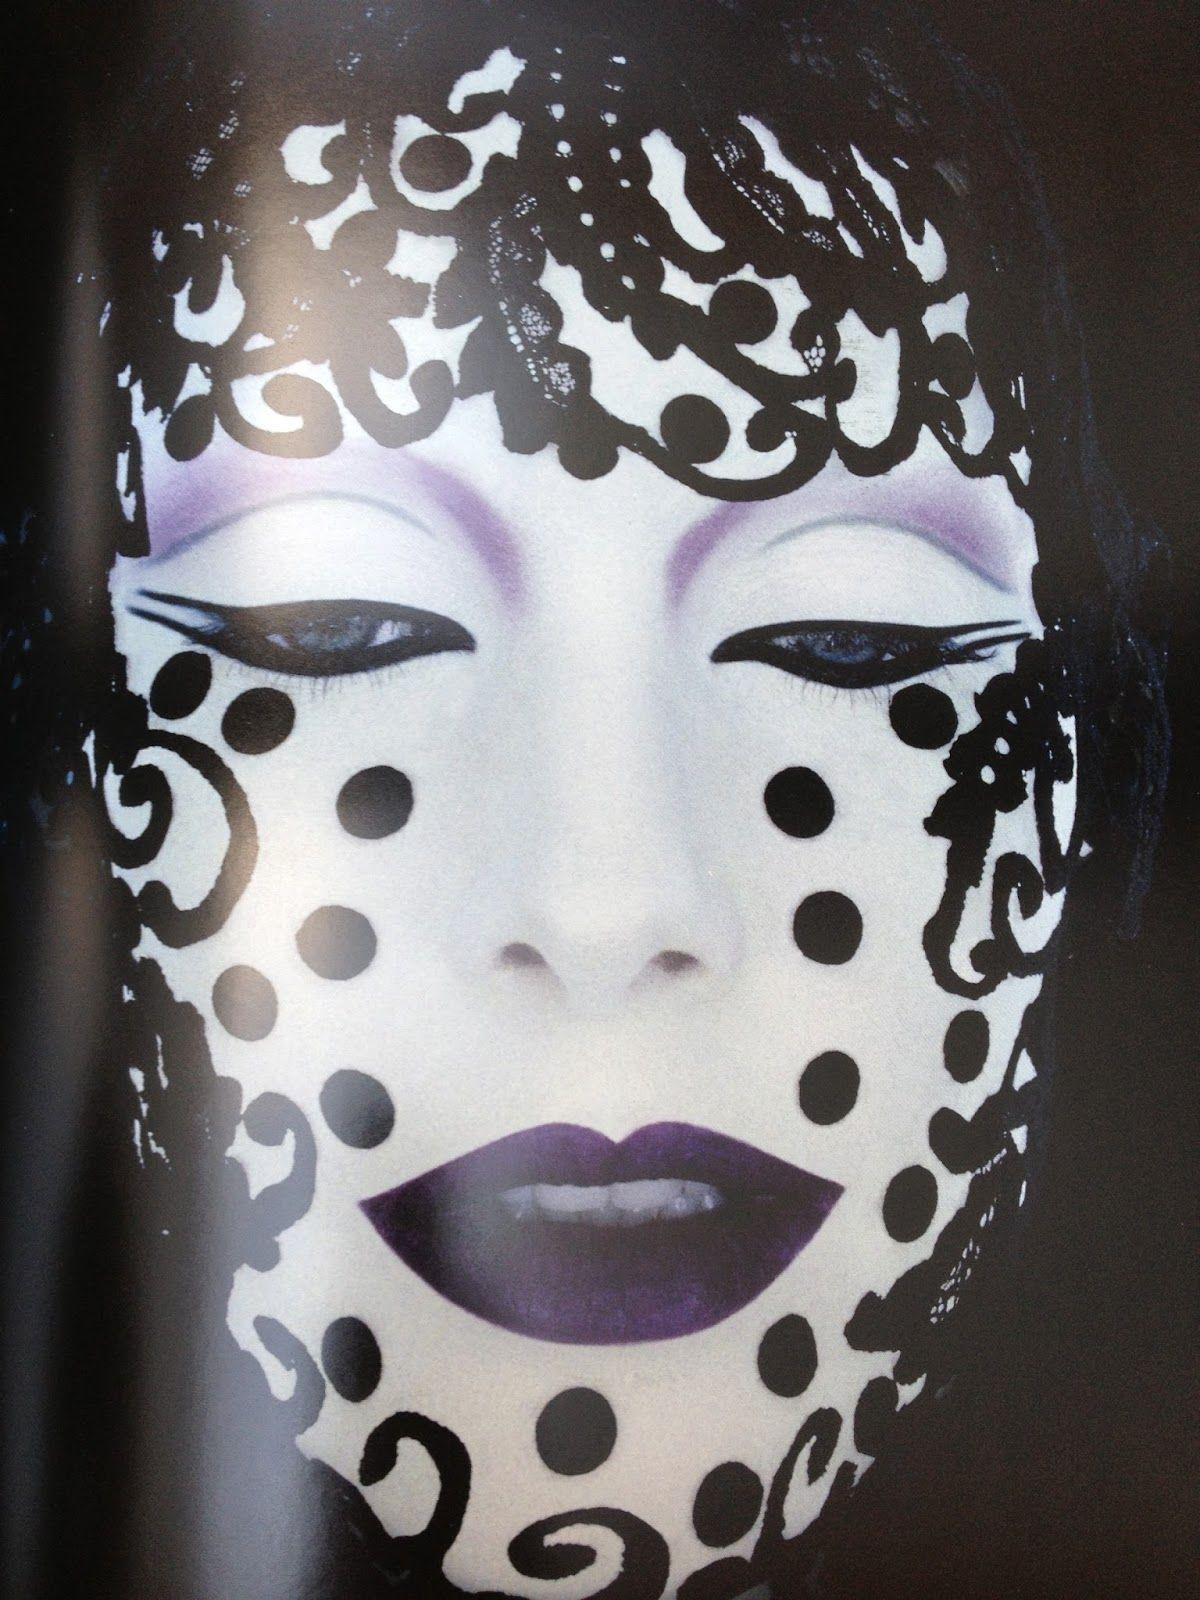 Serge Lutens Face painting halloween, Perfume art, Body